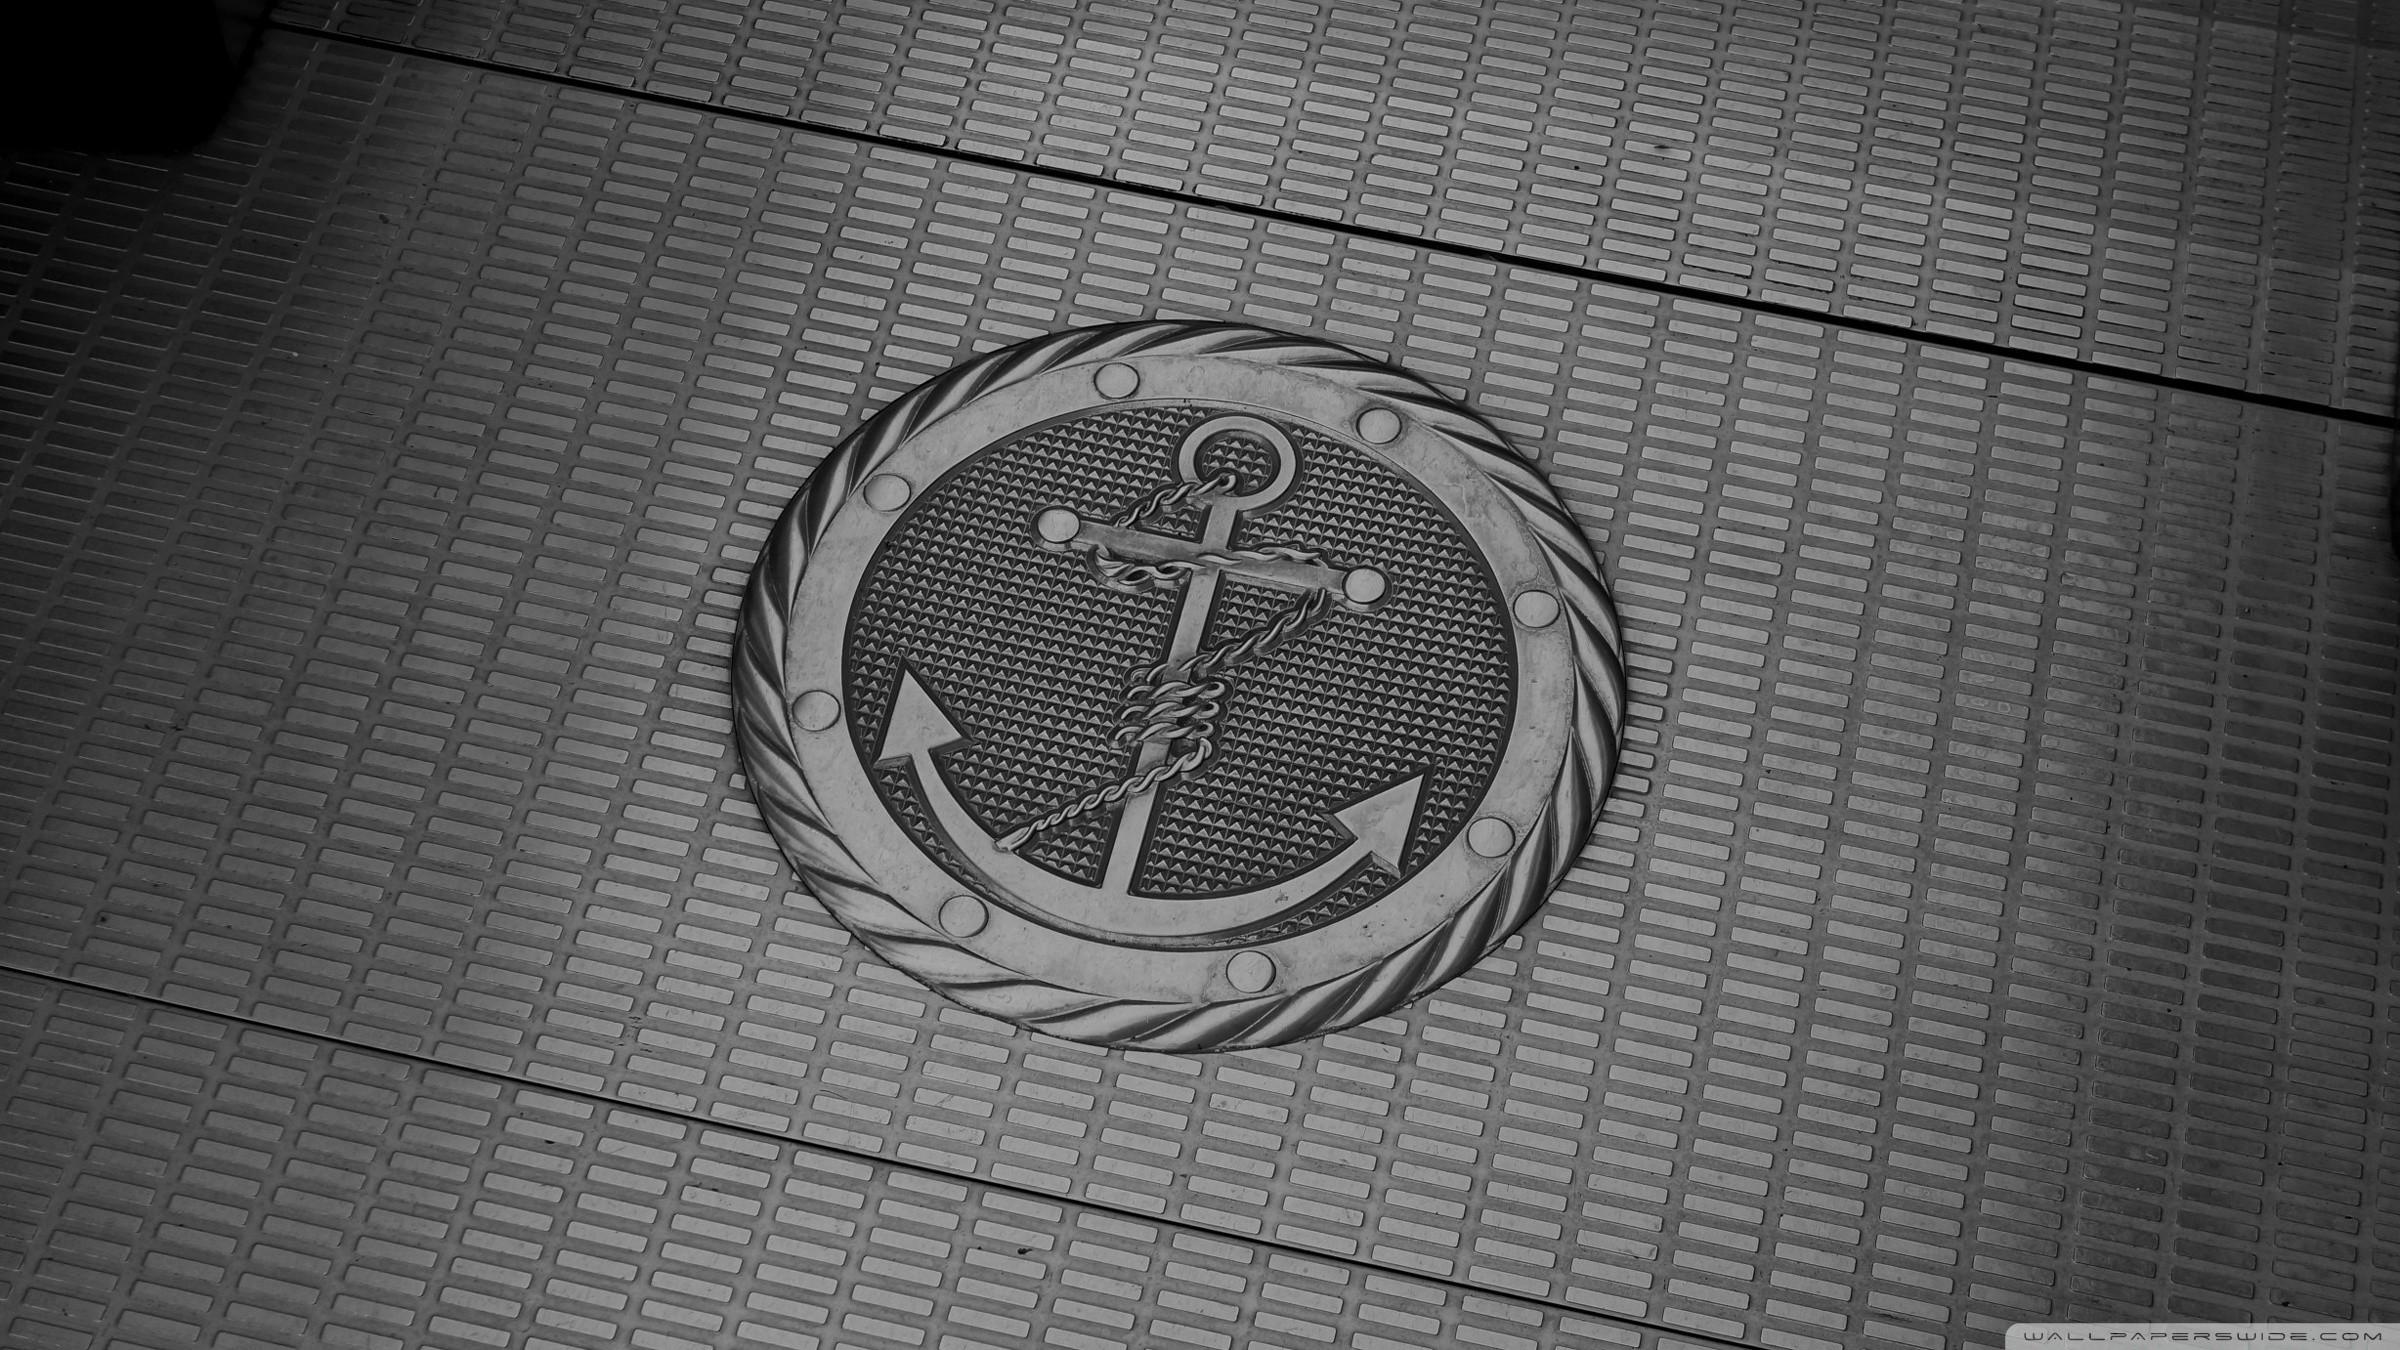 3150x1258 Free Nautical Desktop Wallpapers